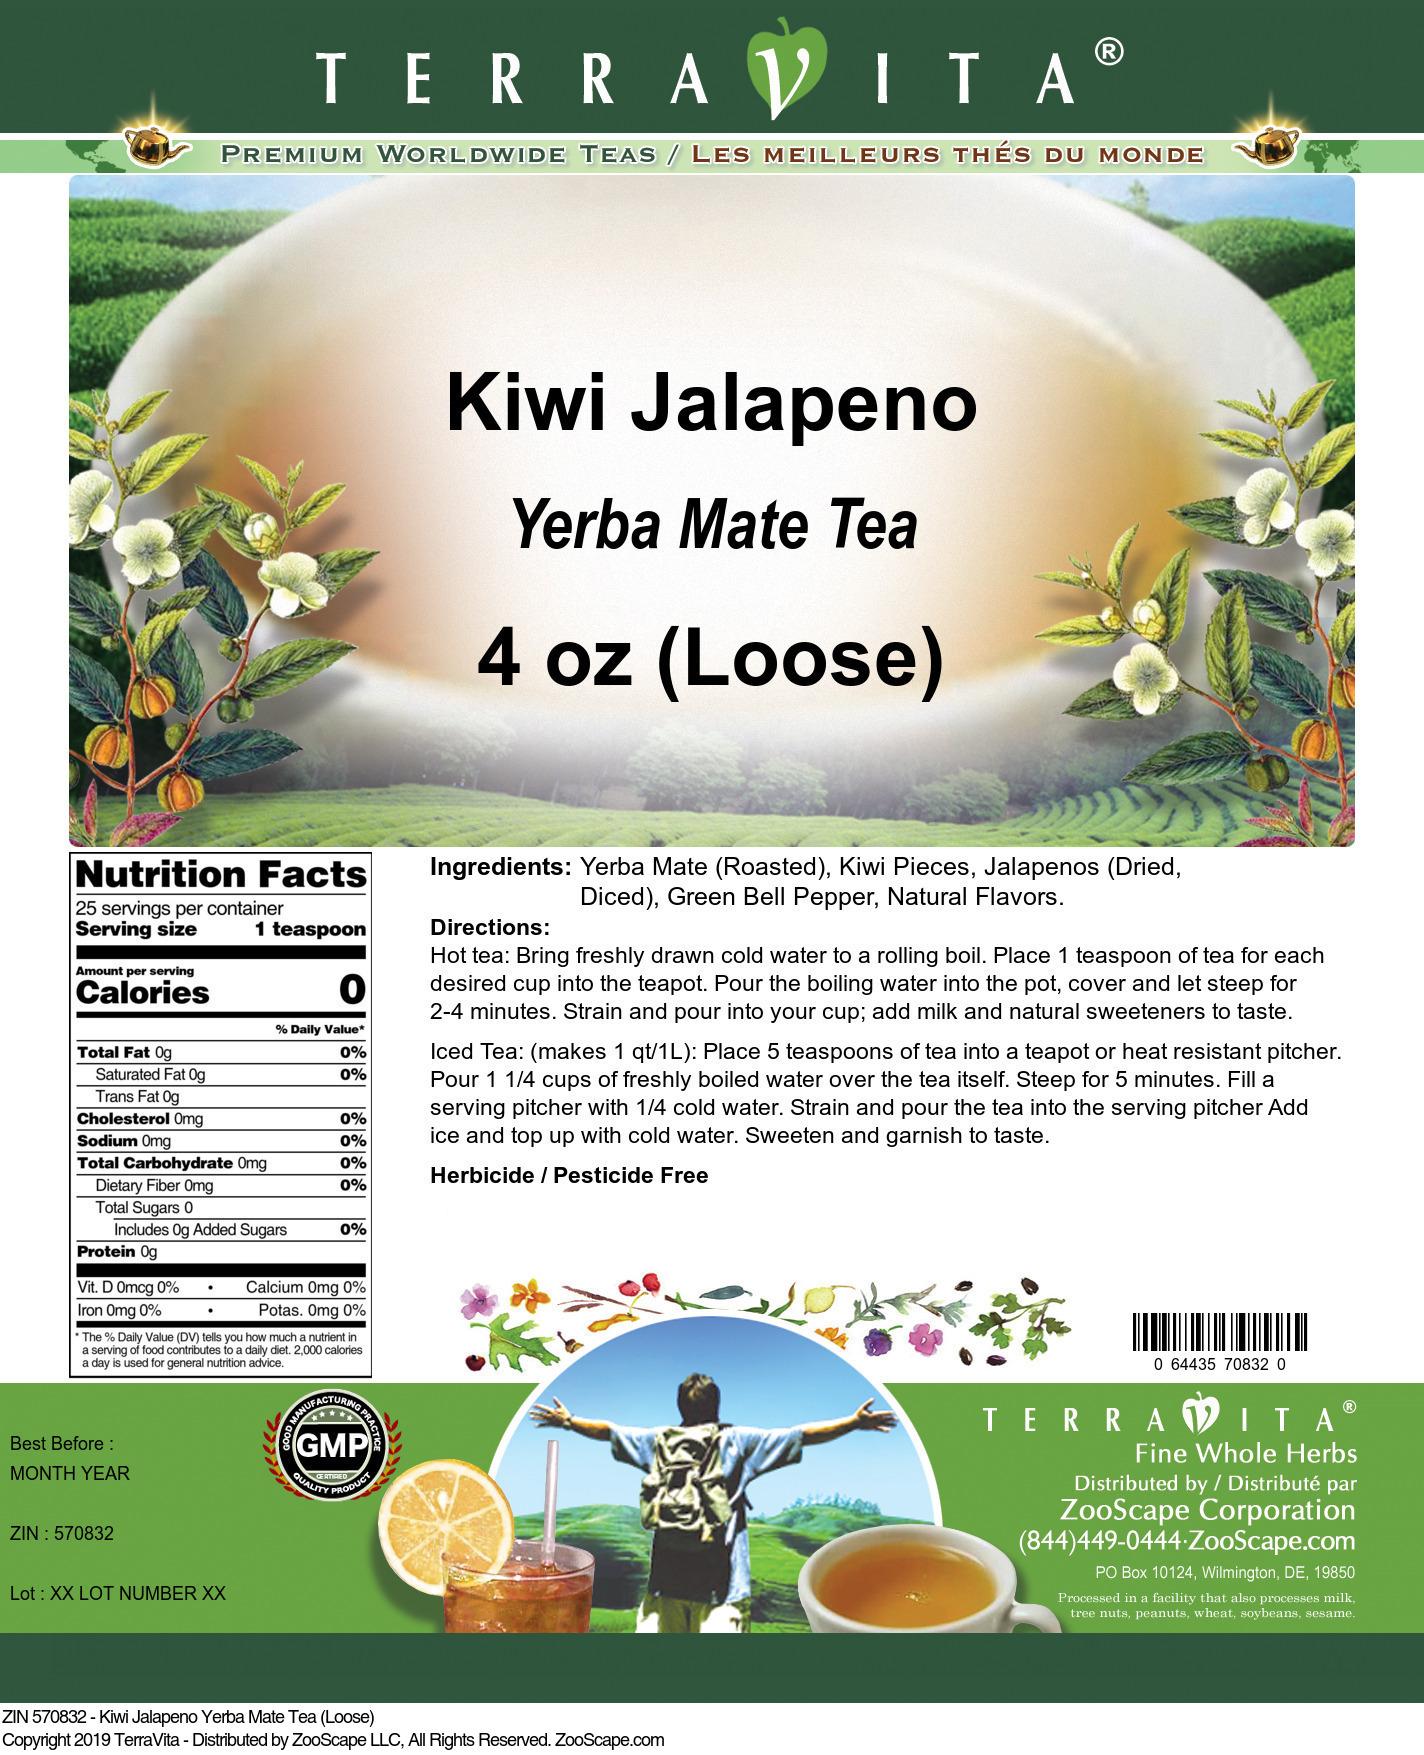 Kiwi Jalapeno Yerba Mate Tea (Loose)